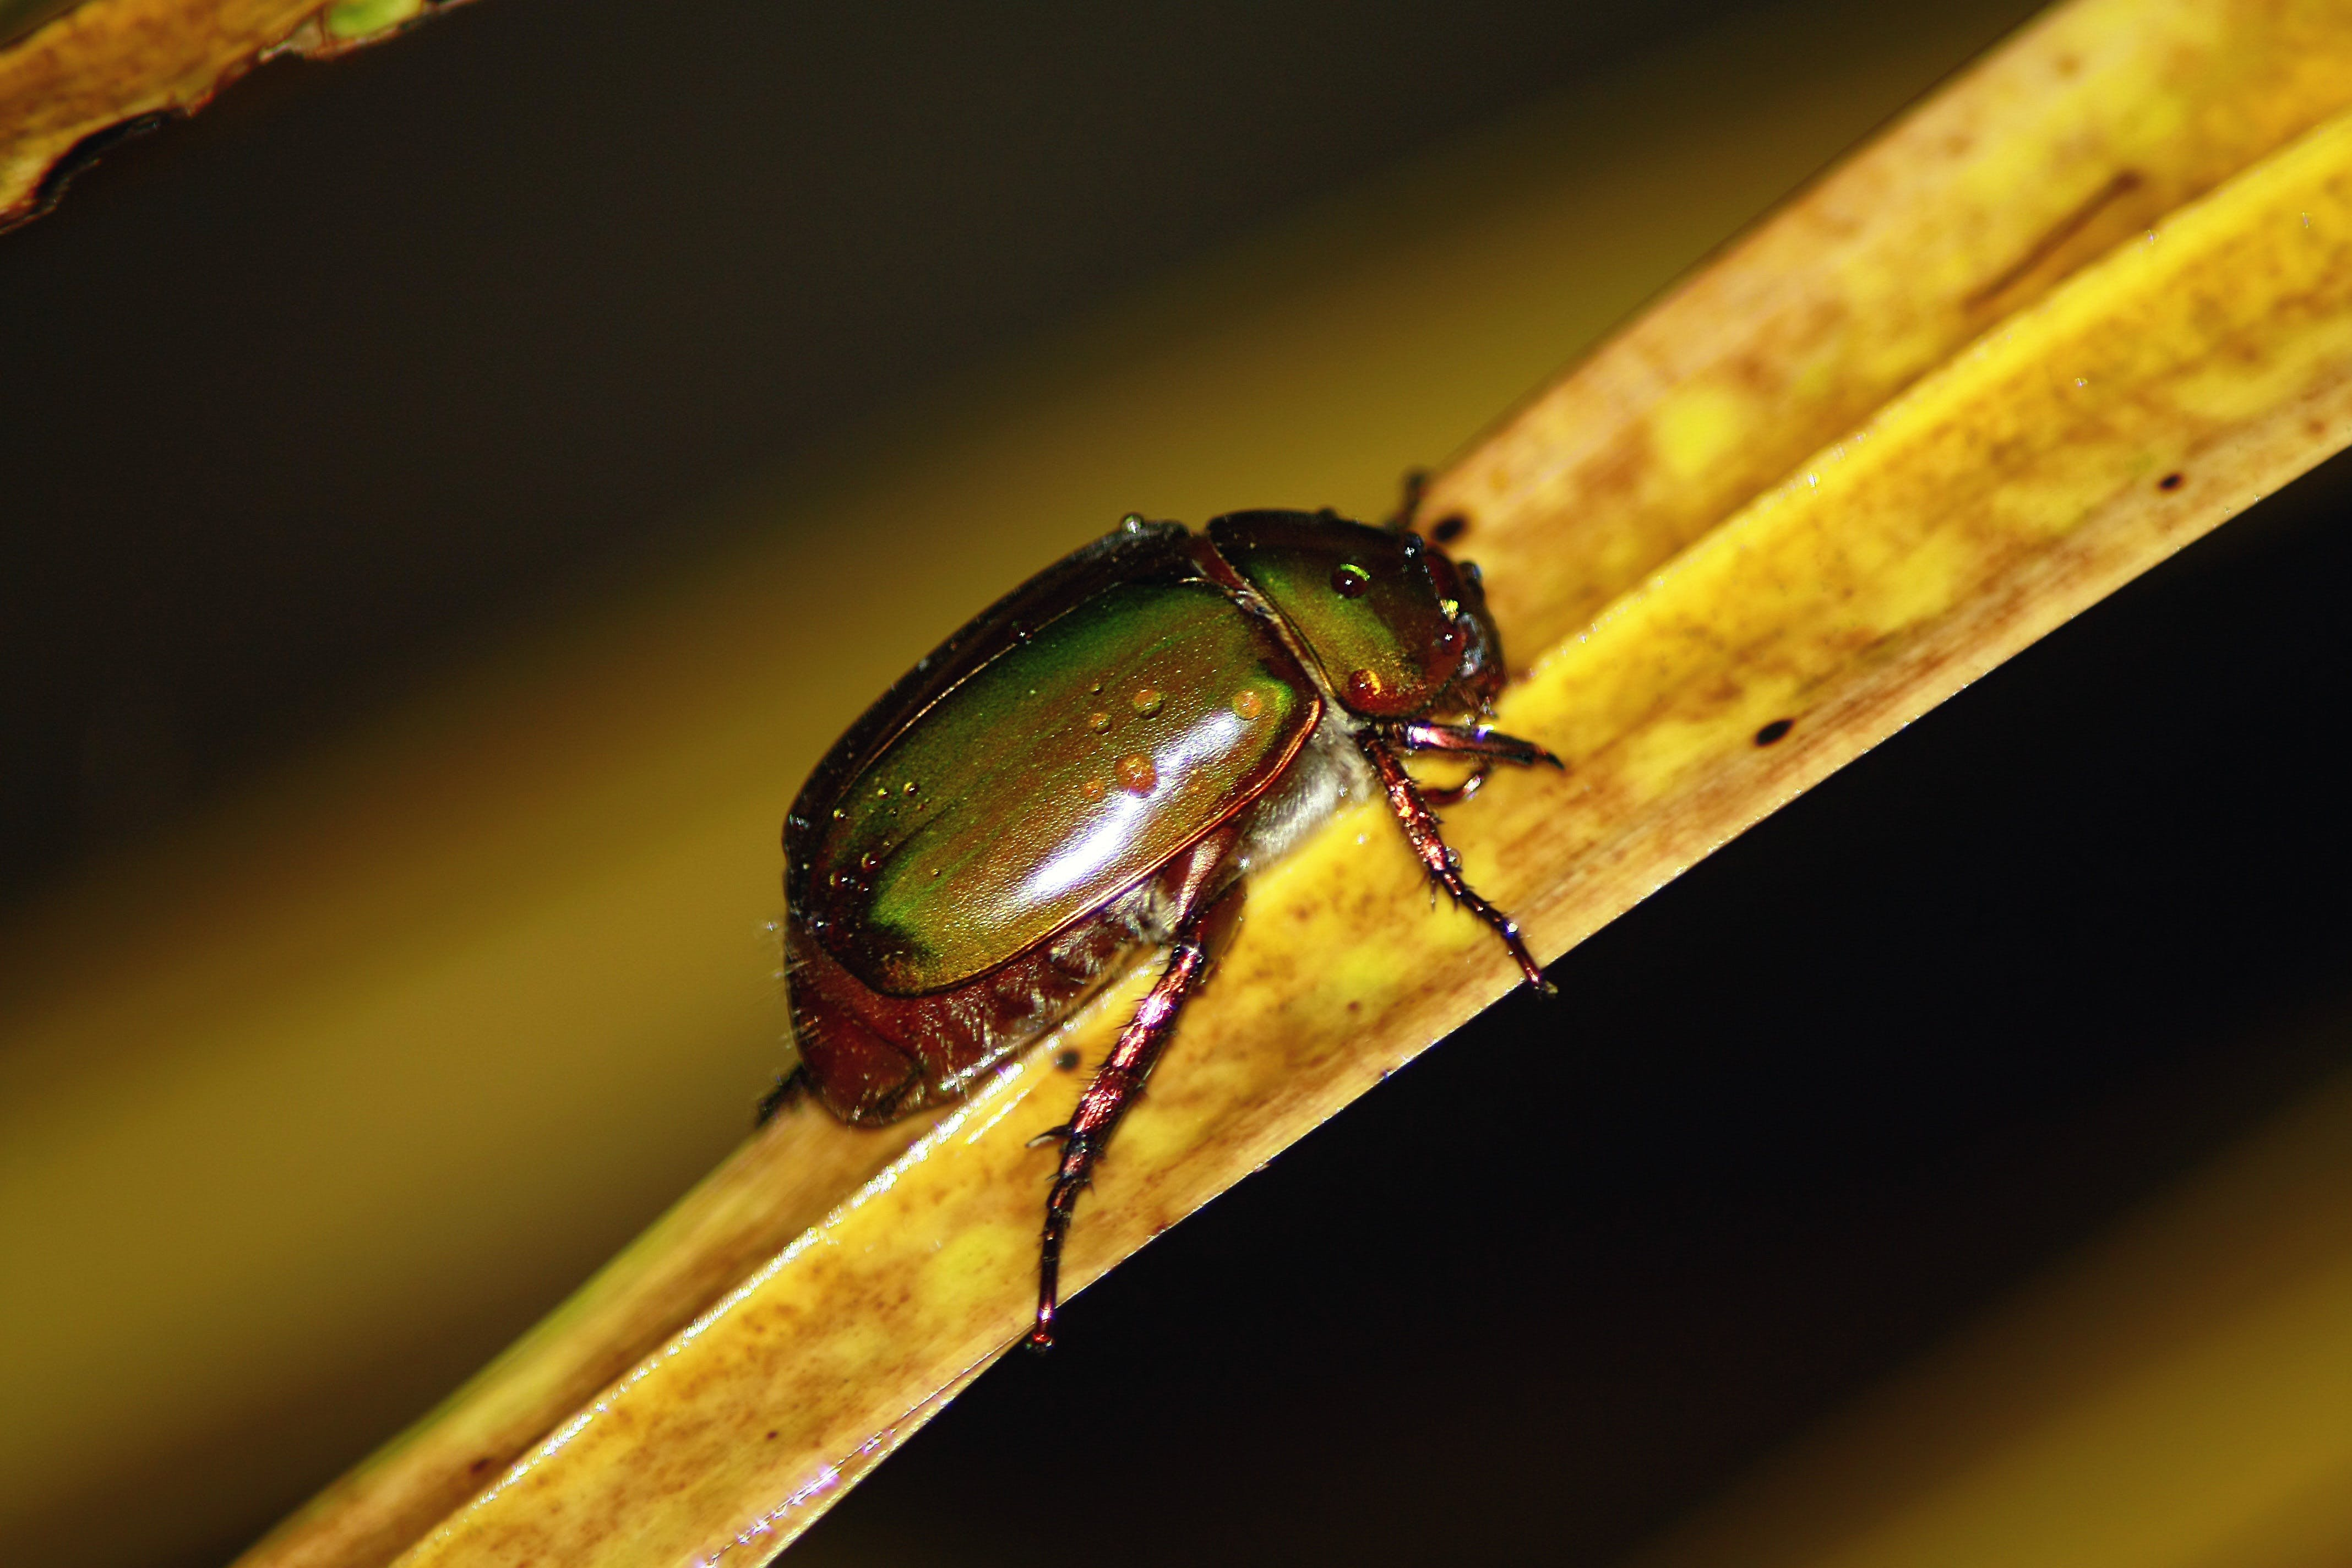 beetle, bug, close-up